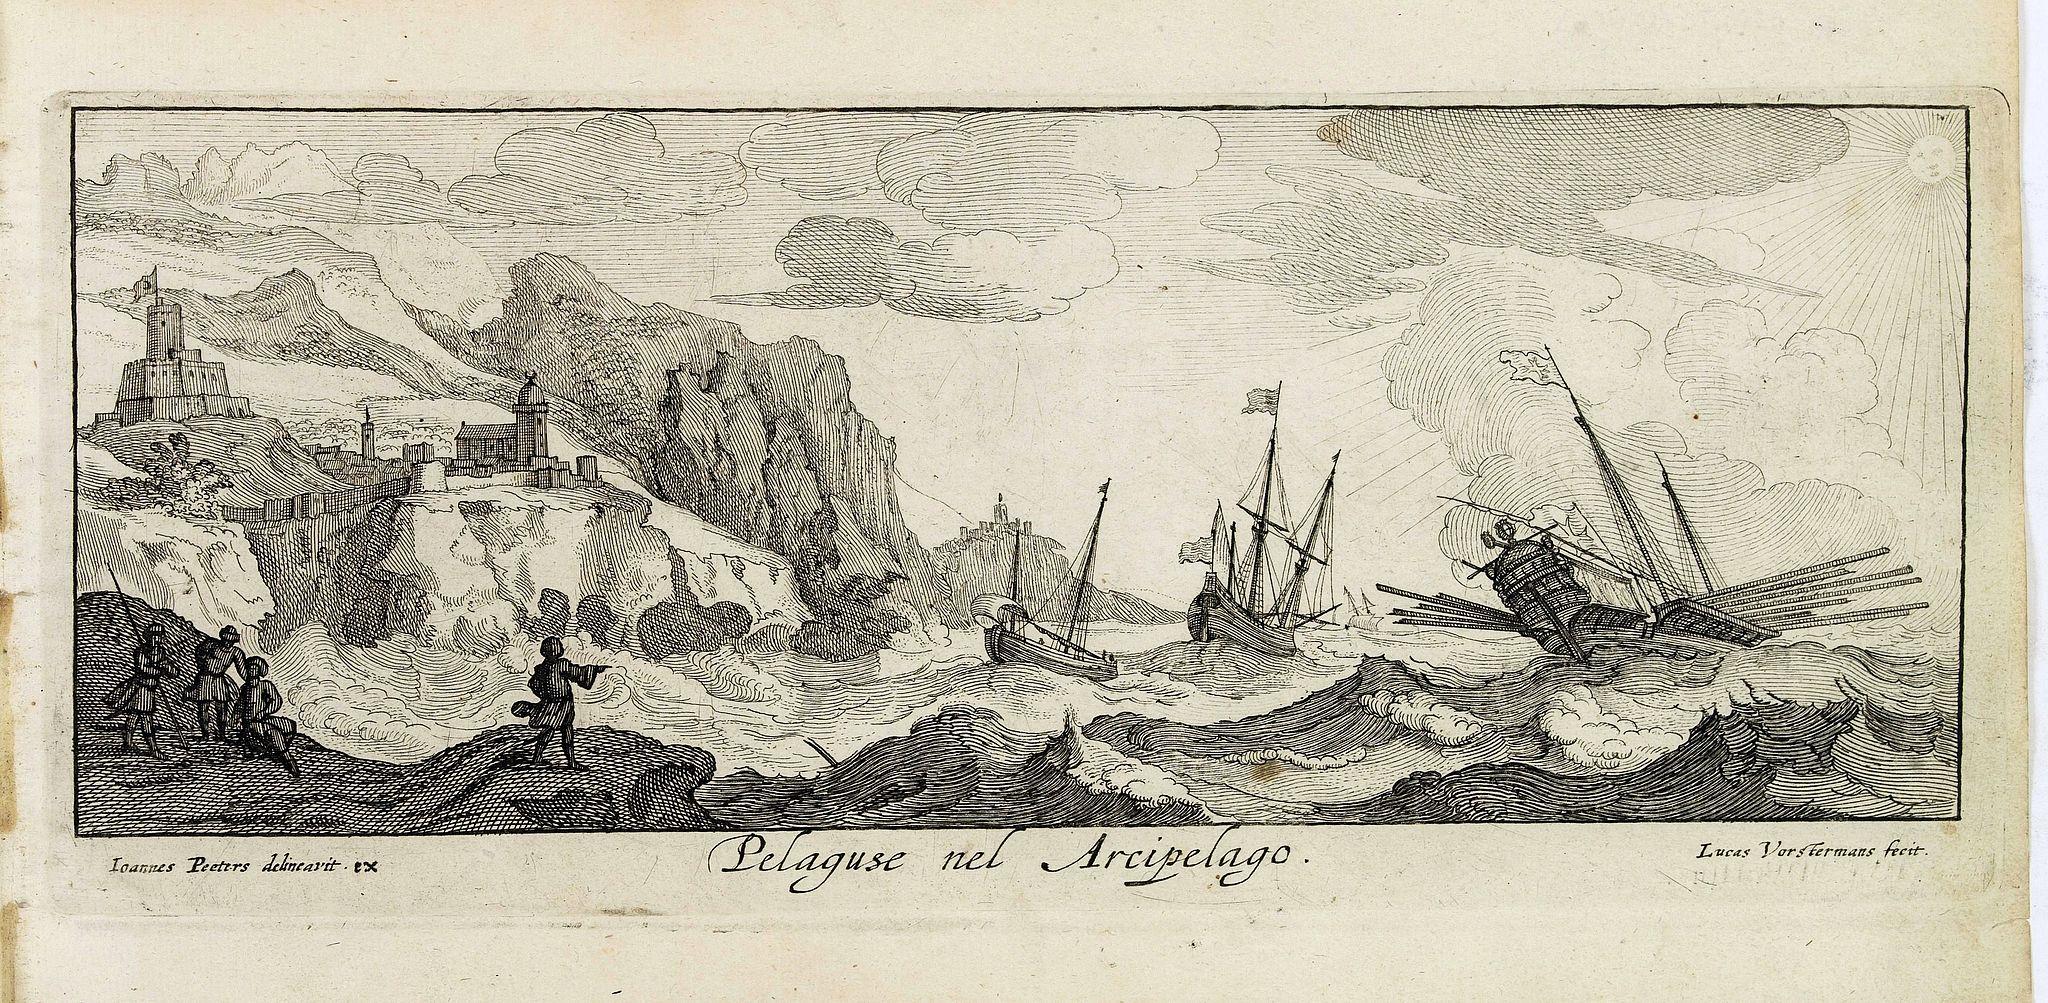 PEETERS, J. / VOSTERMANS II, L. -  Pelaguse nel Arcipelago. (Pegalos)